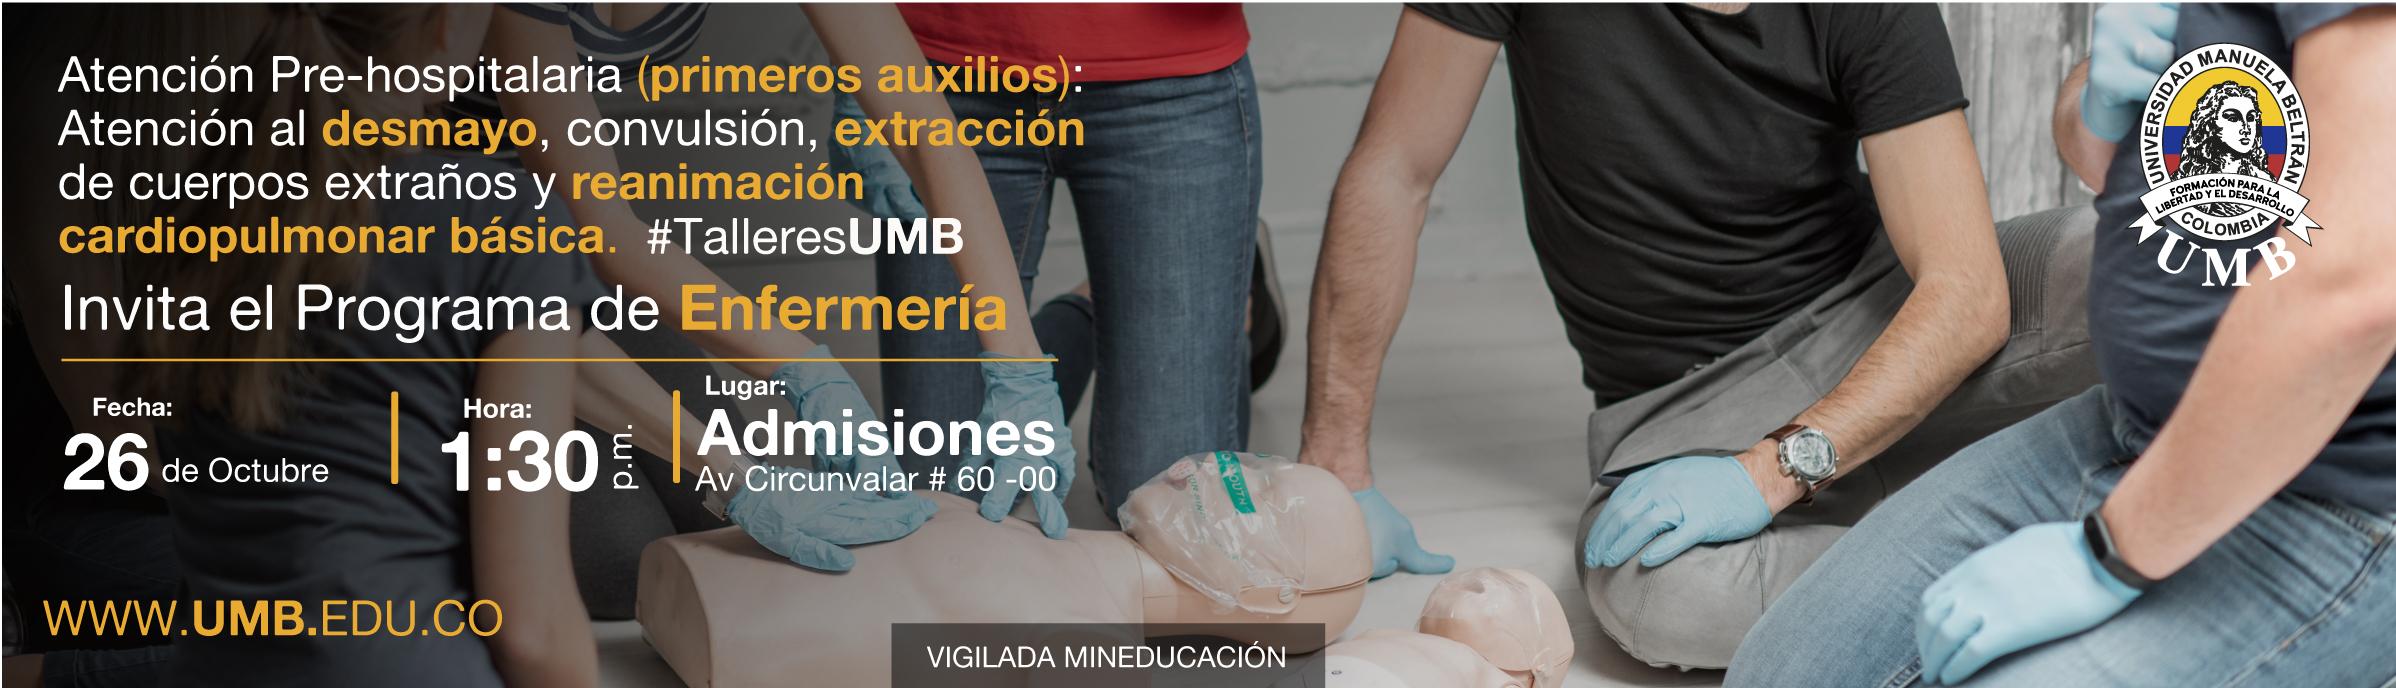 Atencion-pre-hospitalaria-bogota-2